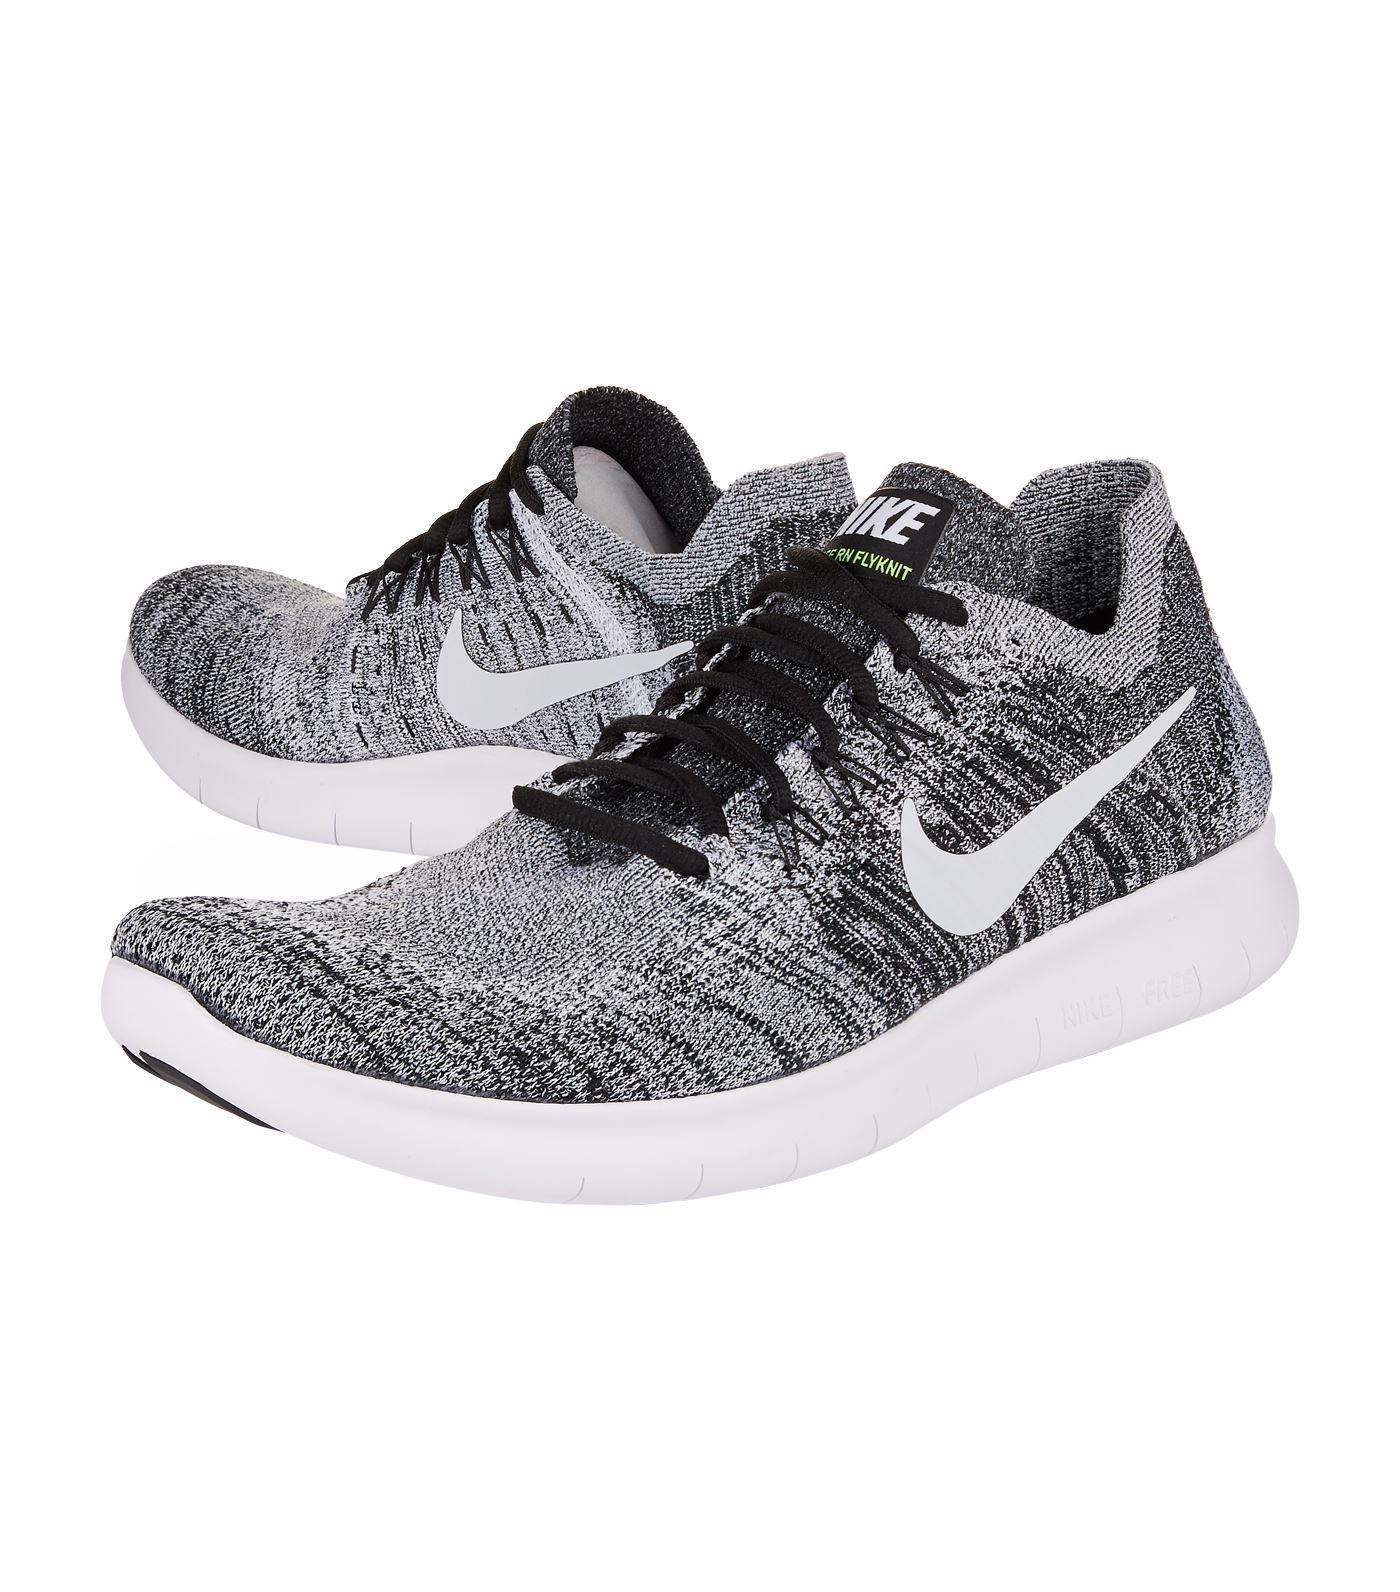 Nike Rubber Free Run Flyknit Running Shoes for Men